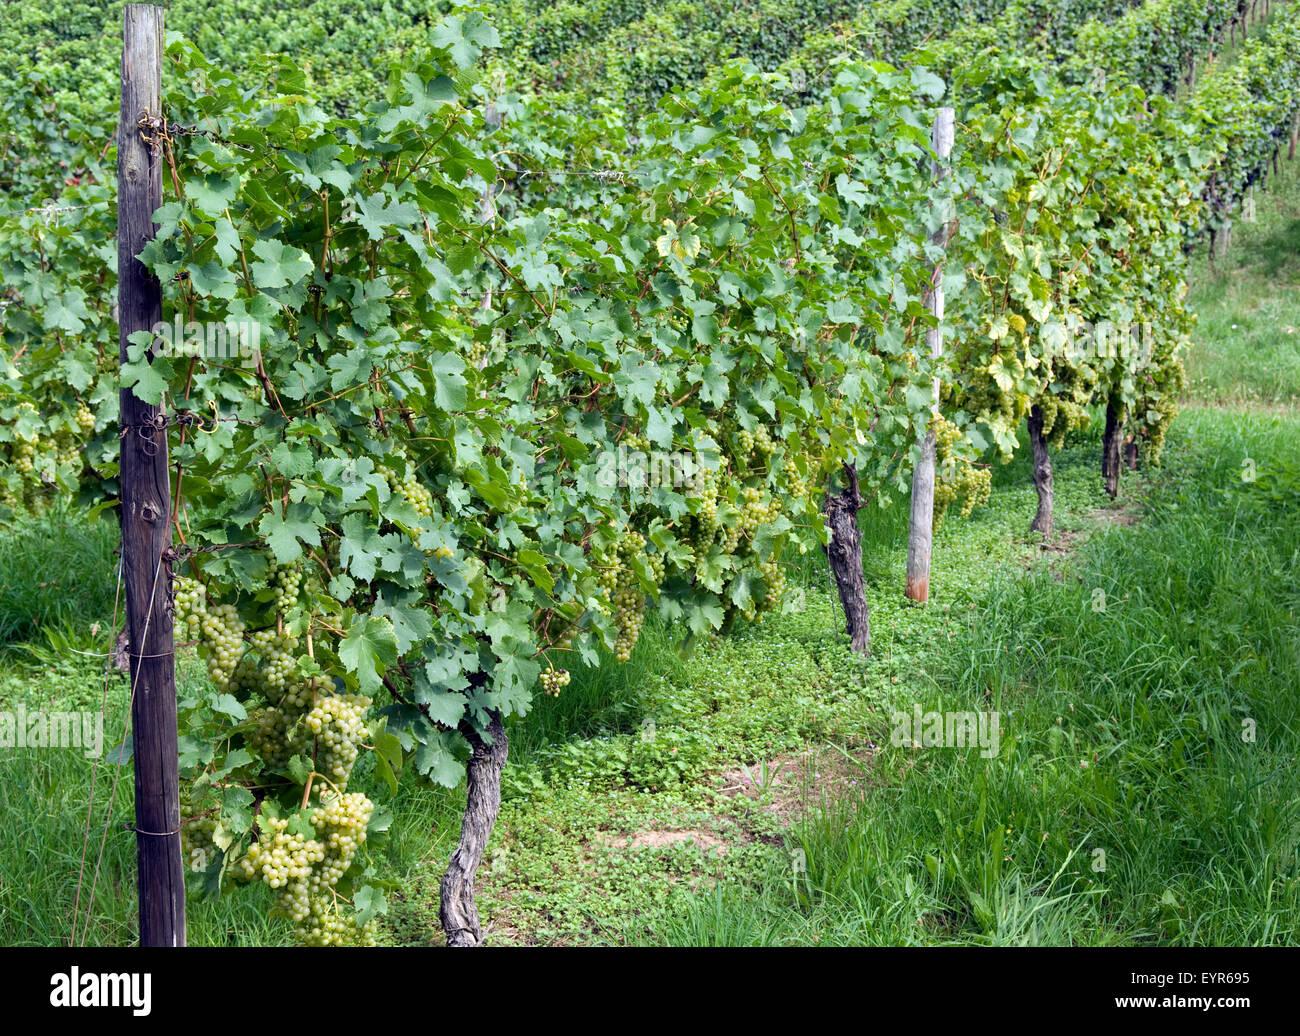 Weinberg, Fendant; Gutedel, Wein, Weinpflanzen, Reben, Fruechte, Beeren, Obst,- Stockbild